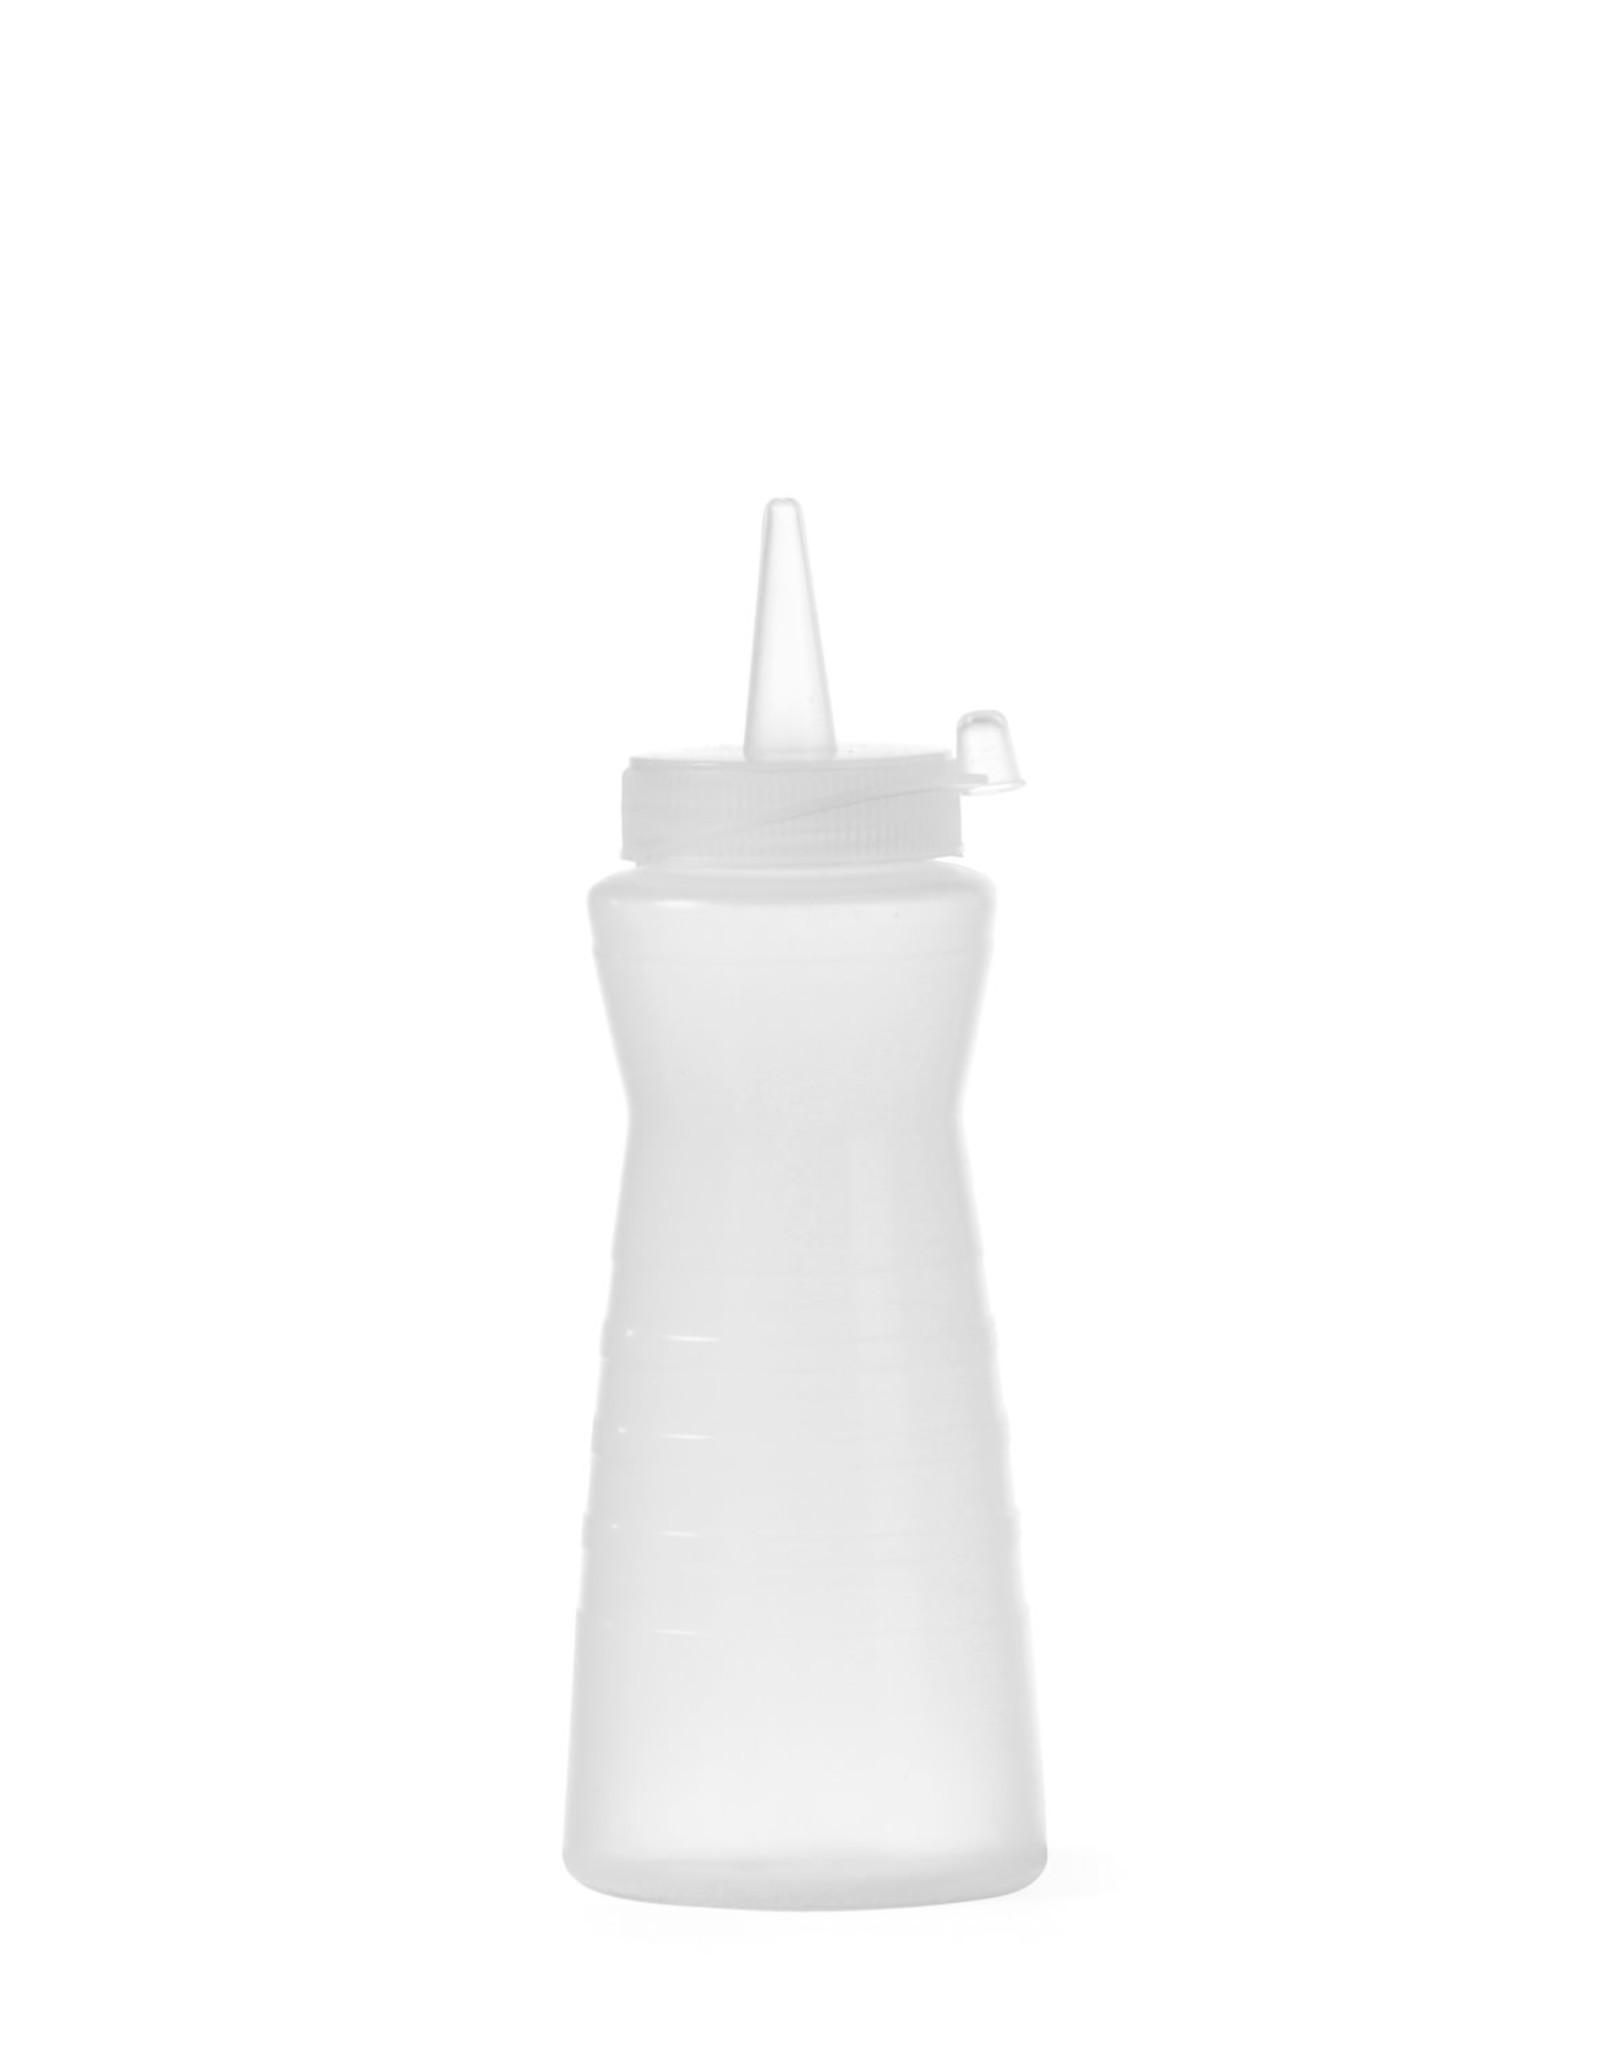 Dispenser flacon/ knijpfles 30 cl easy squeeze